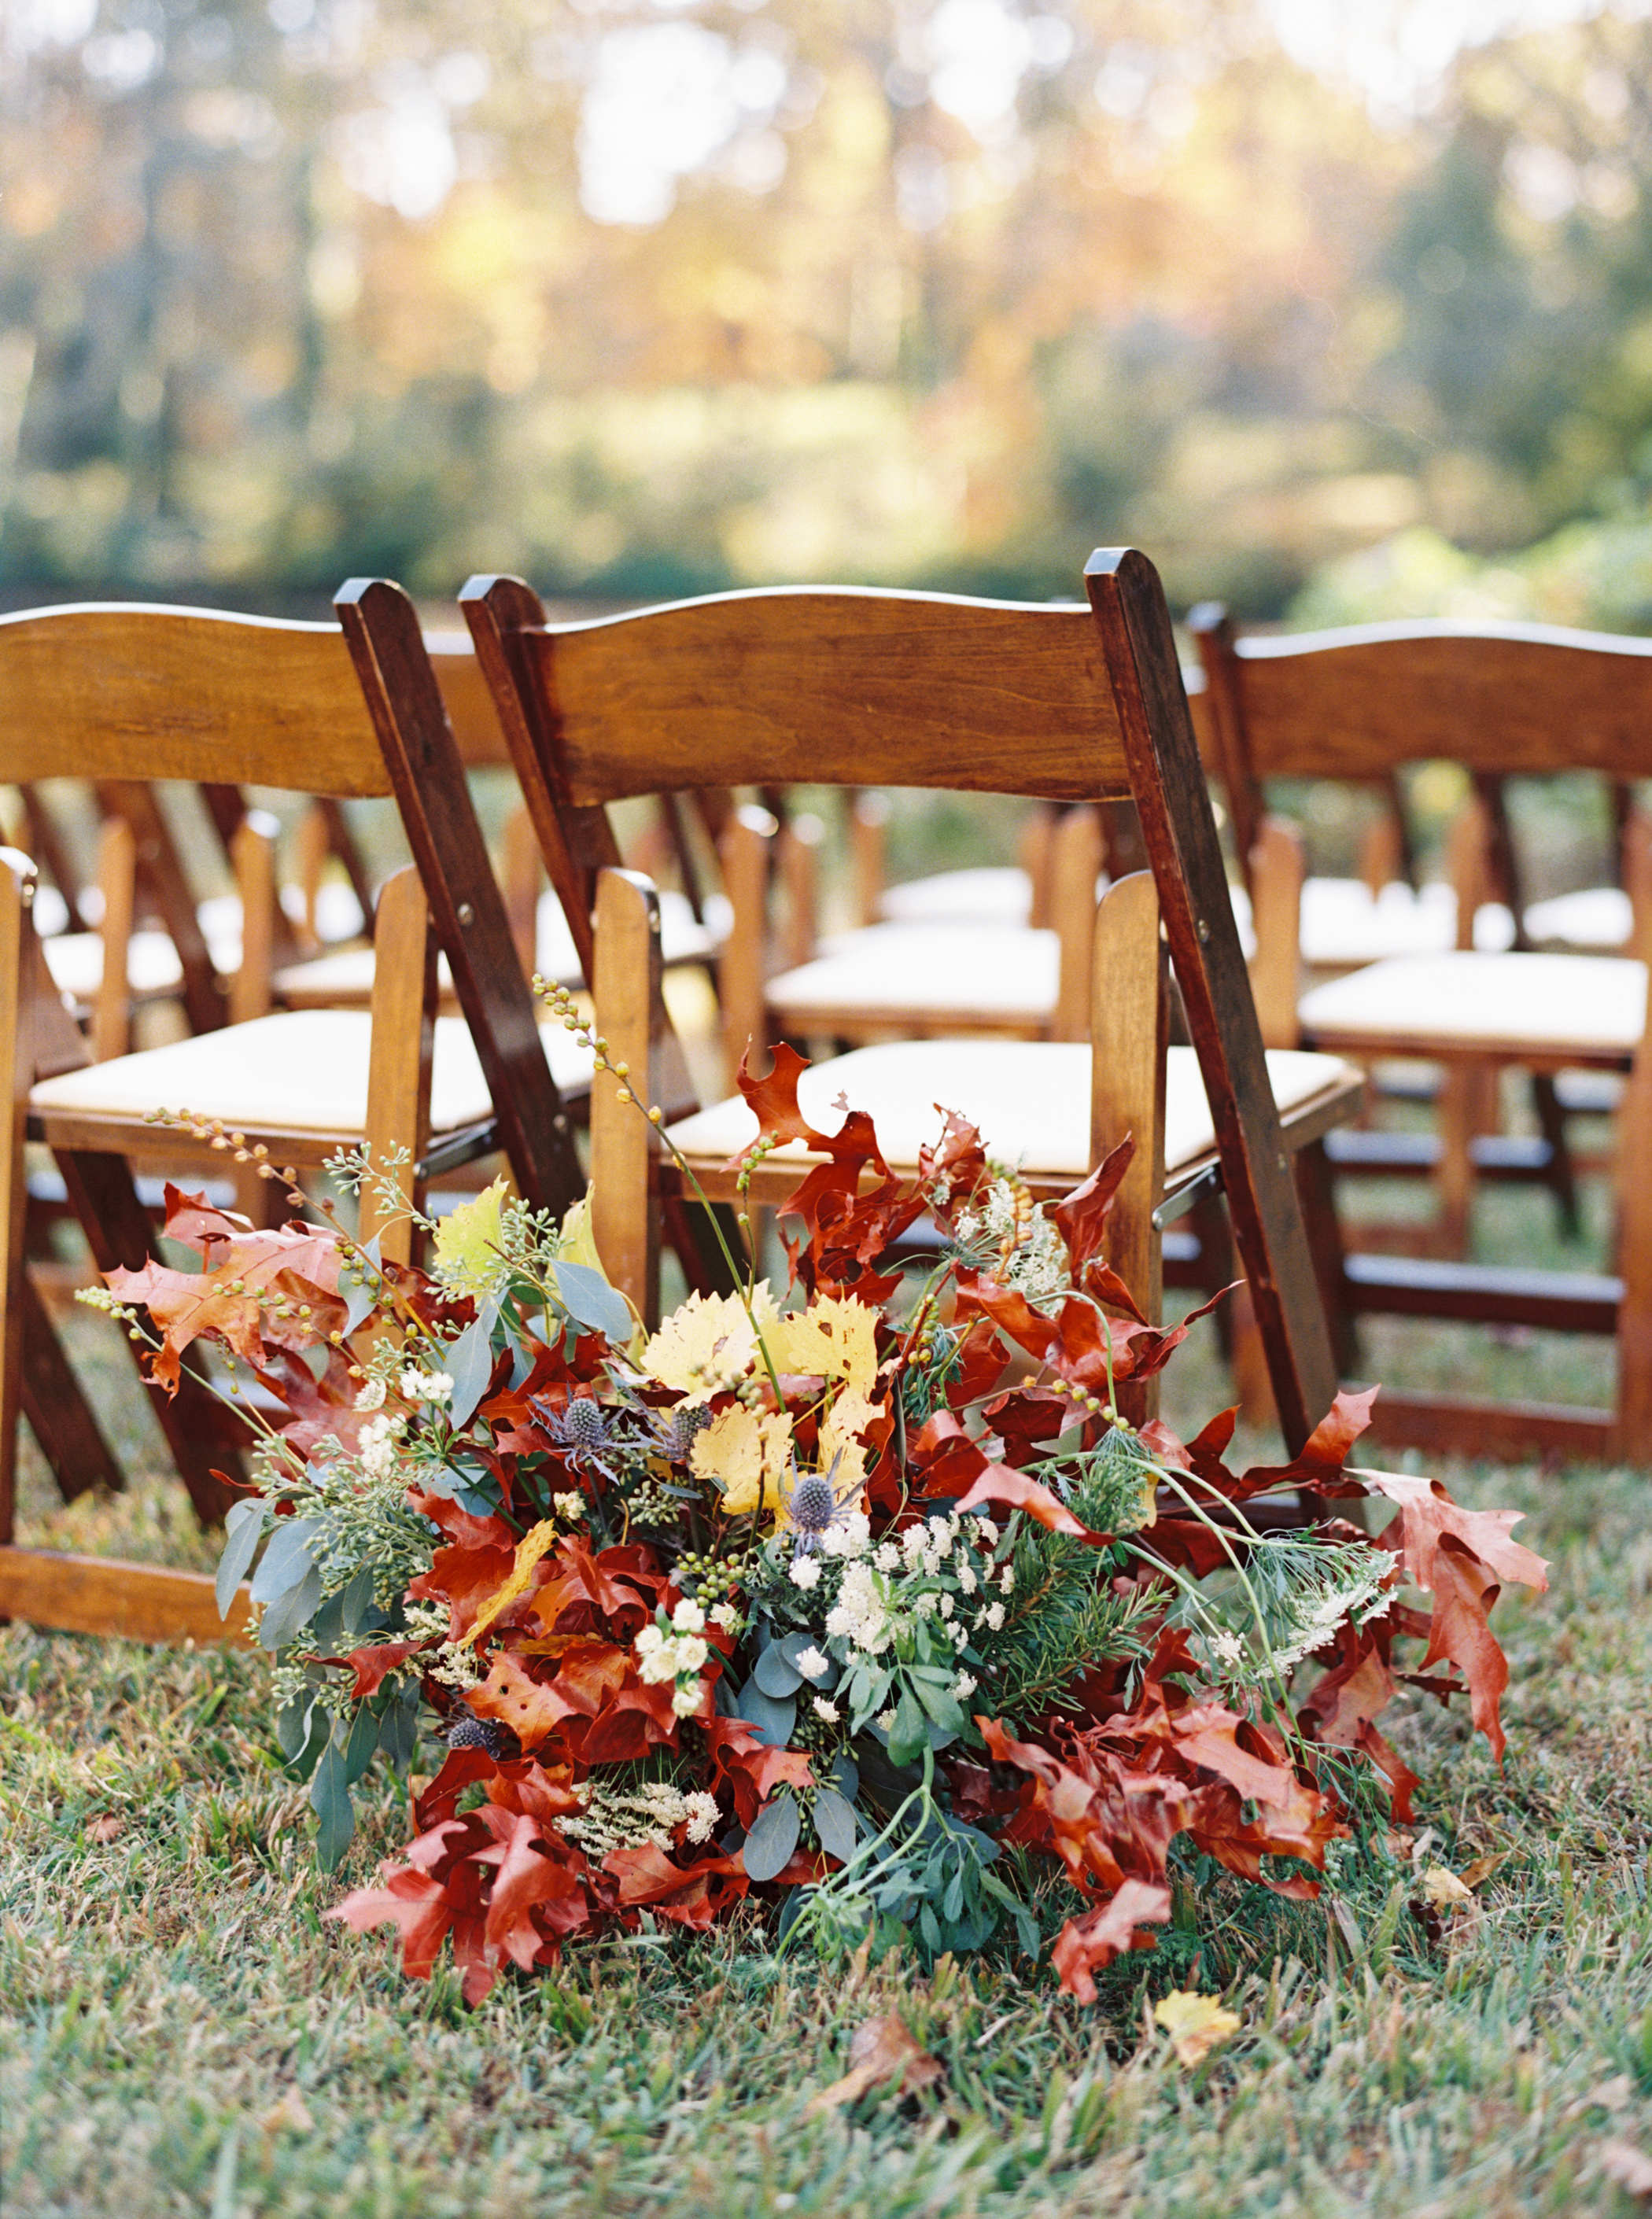 36 Ways to Use Leaves Throughout Your Wedding | Martha Stewart Weddings